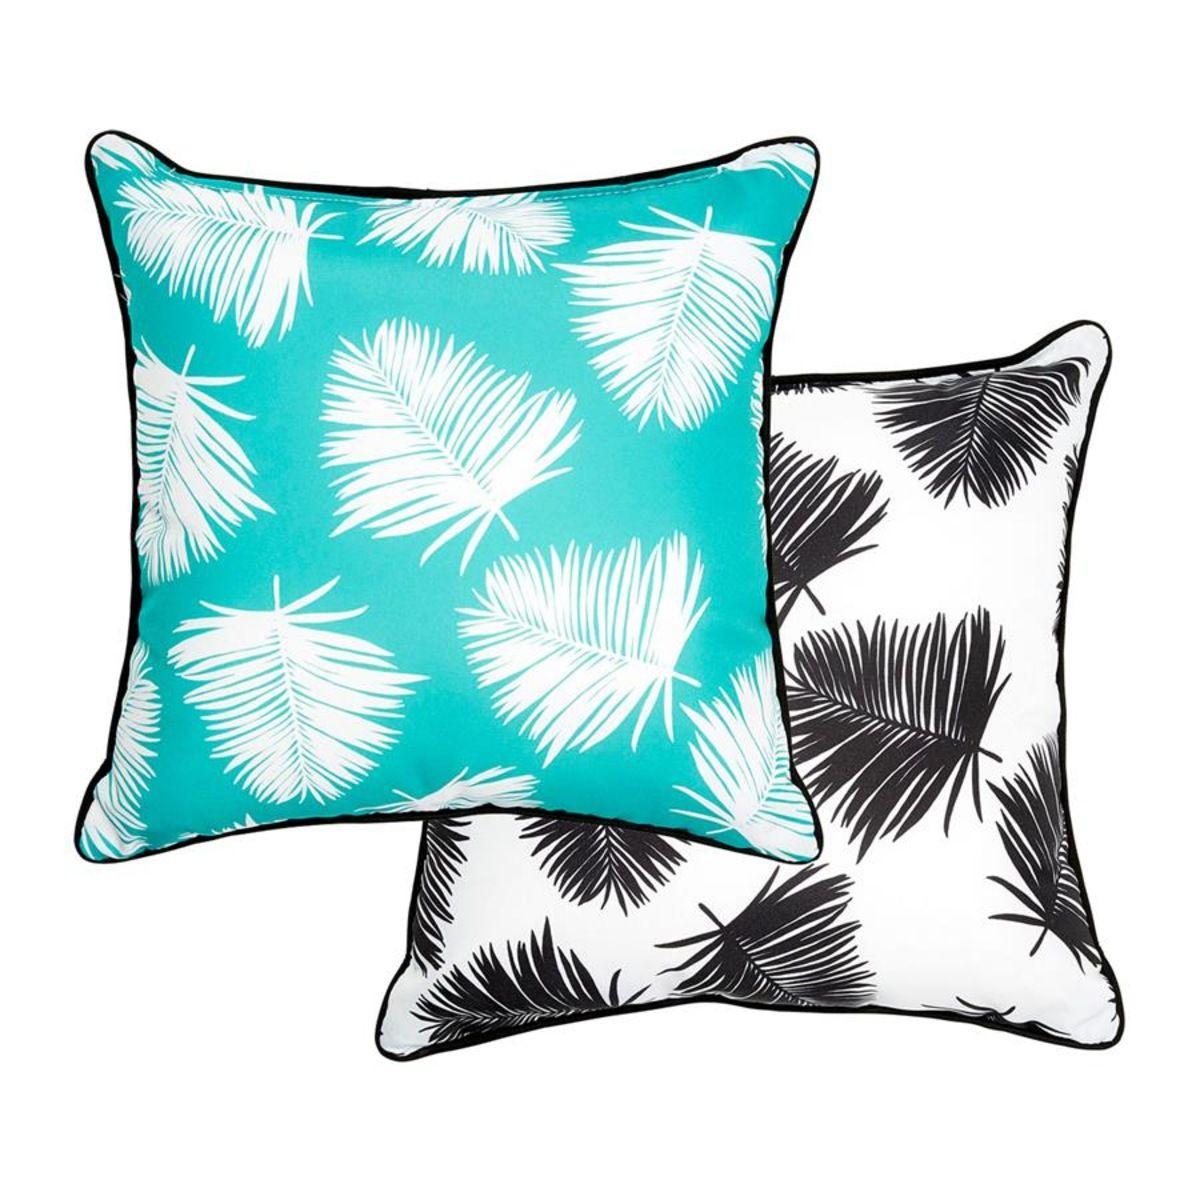 Reversible Cushion Island Palm Kmart Cushions